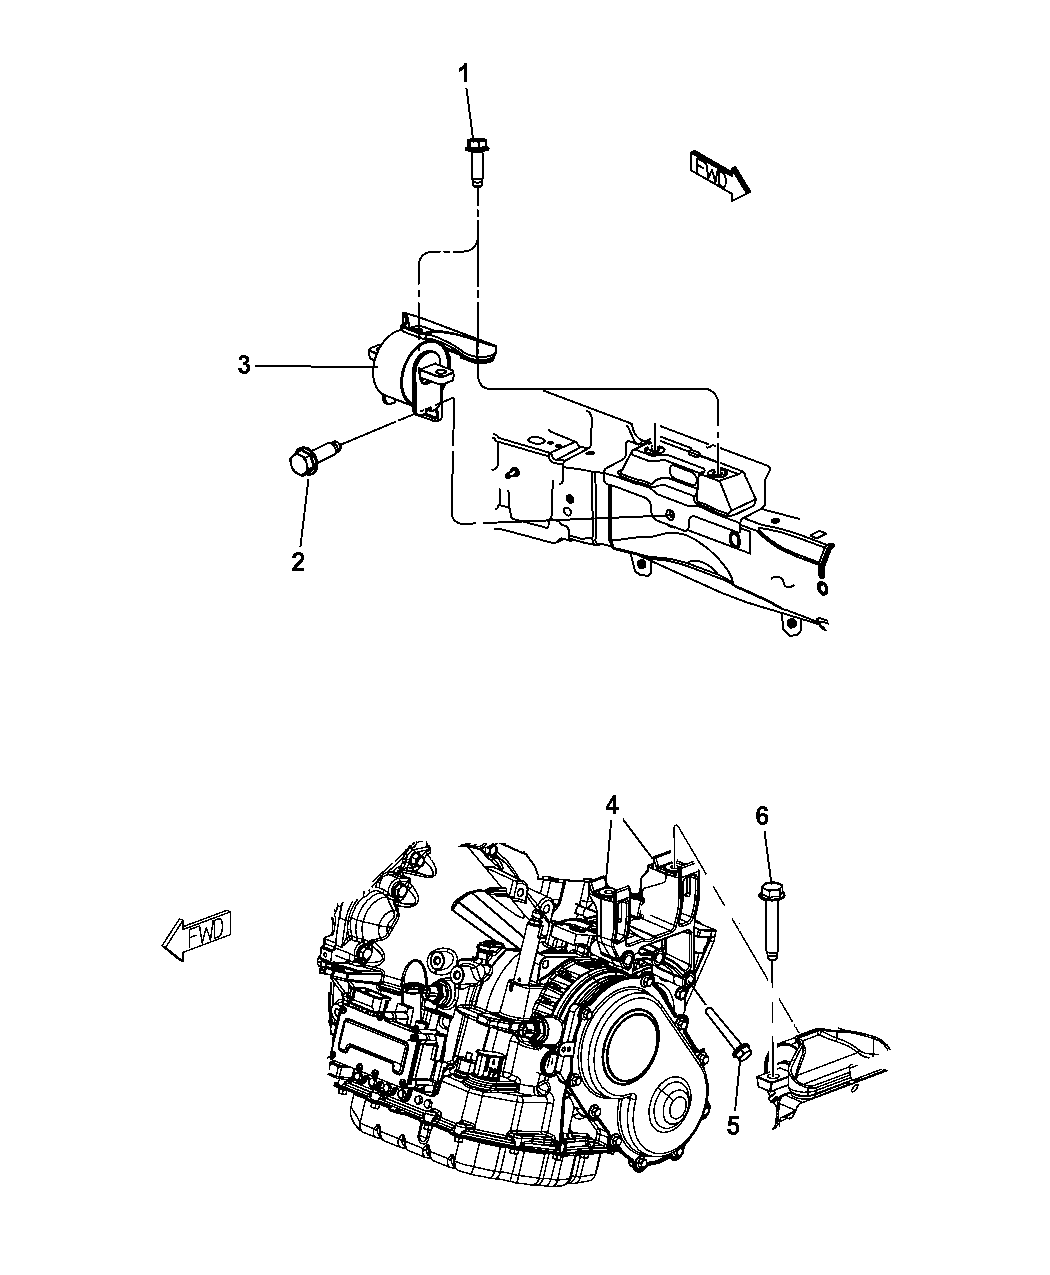 2012 Dodge Avenger Serpentine Belt Replacement